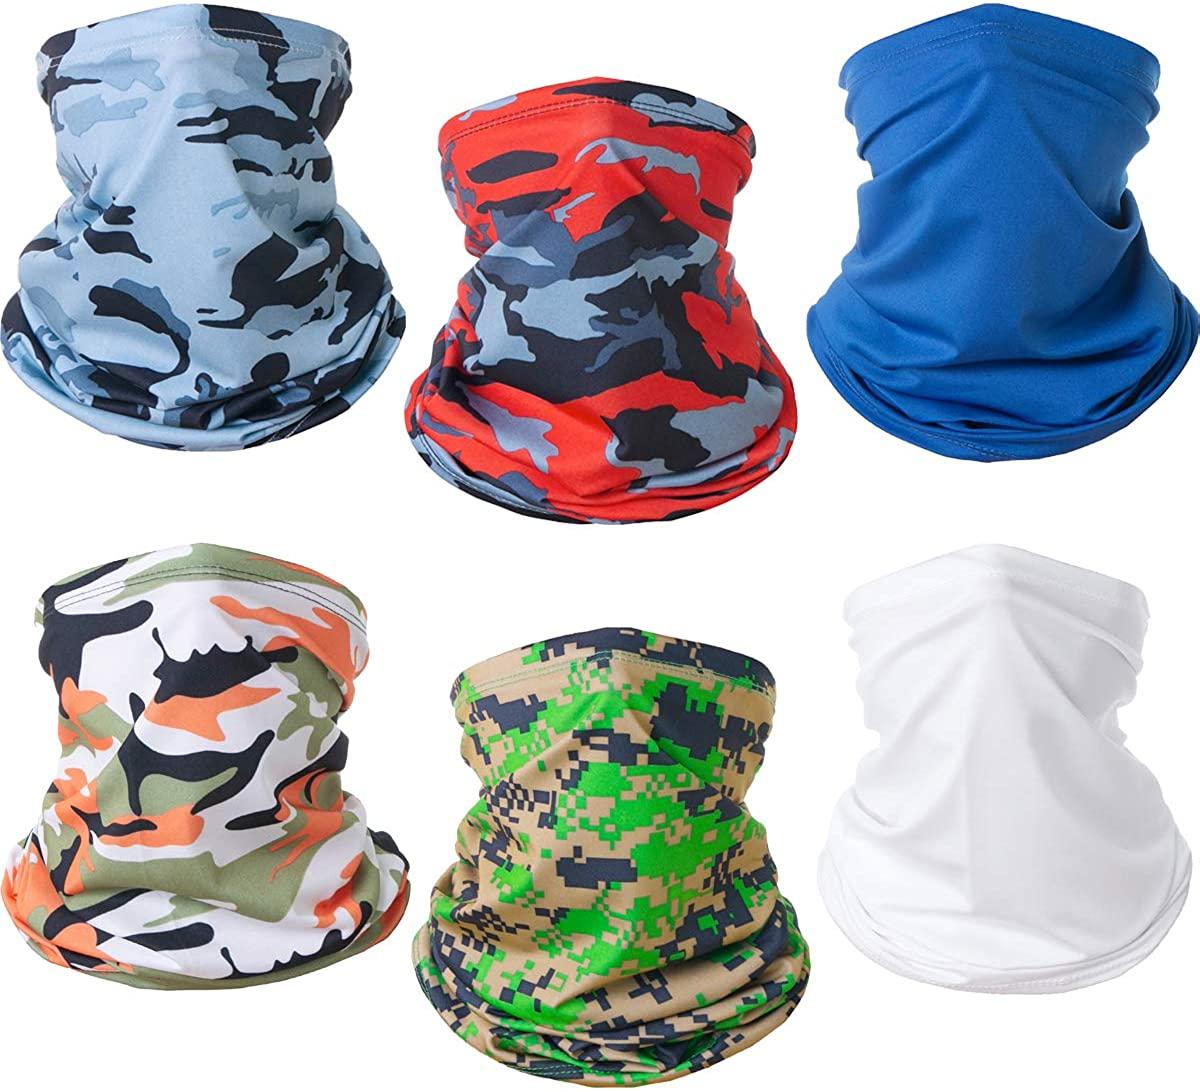 CAMTOP UV Protection Neck Gaiter Face Mask for Men Women Cooling Bandana Mask Camo Fishing Mask